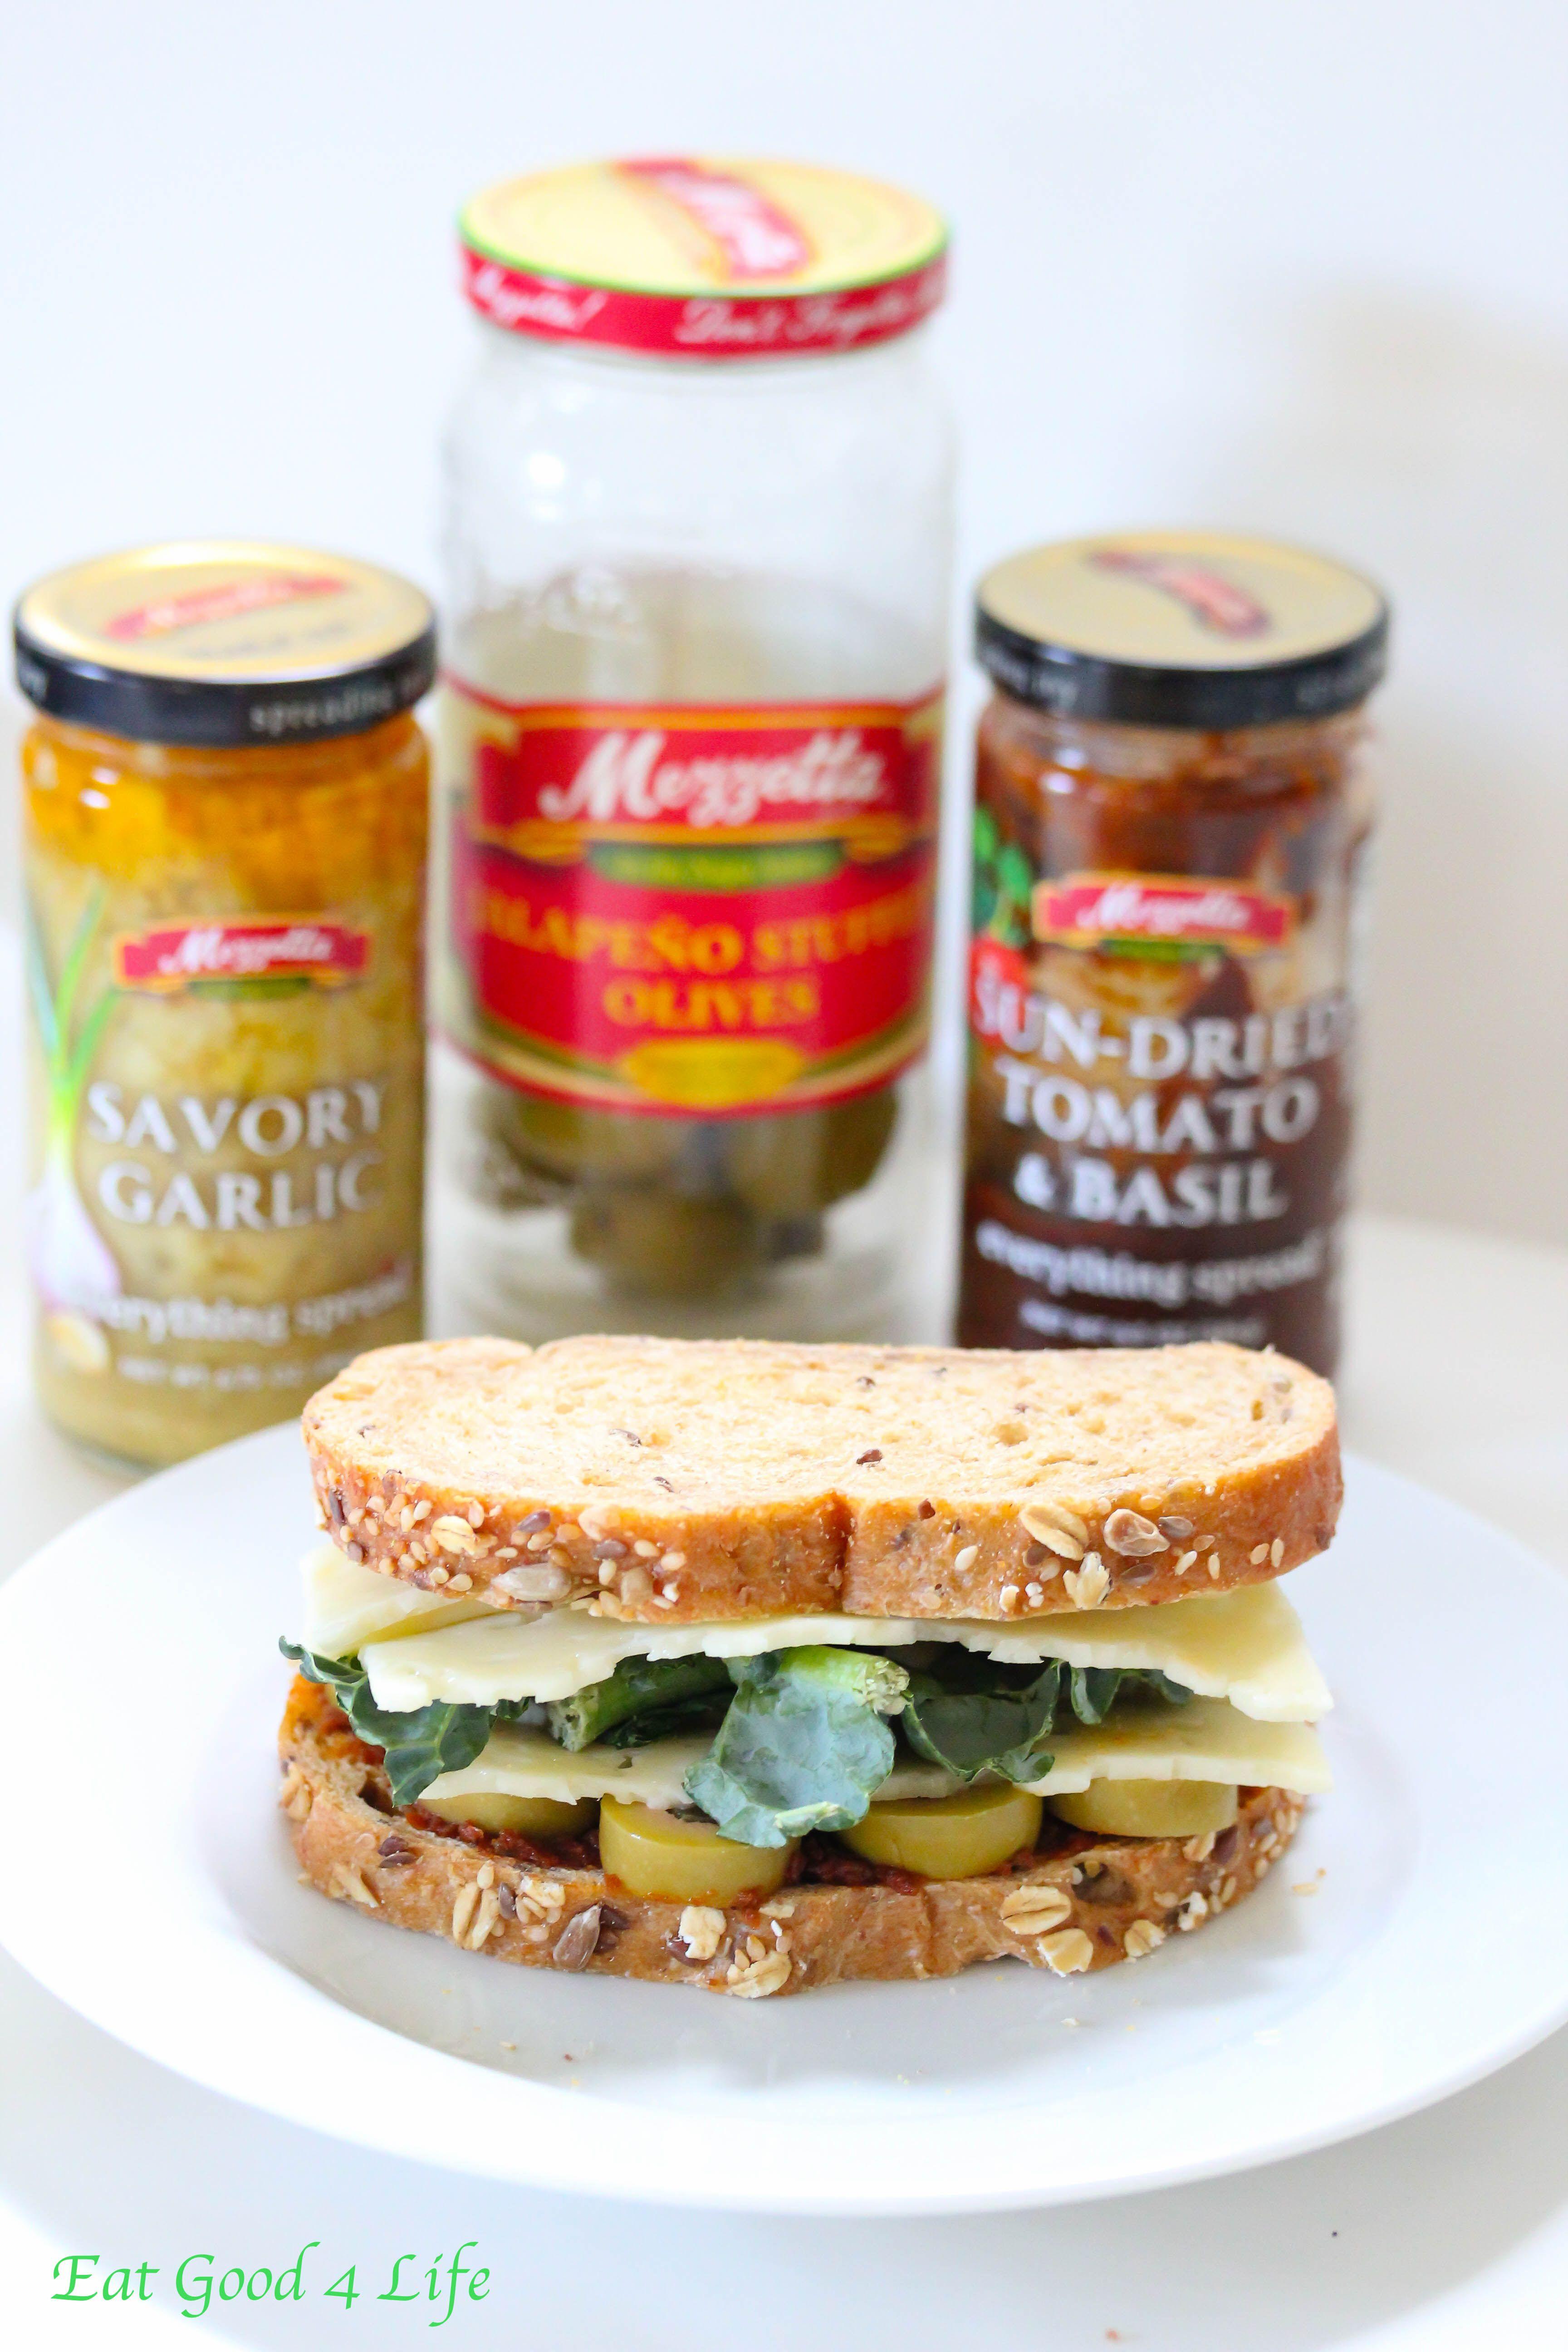 kale and sun dried tomato sandwich